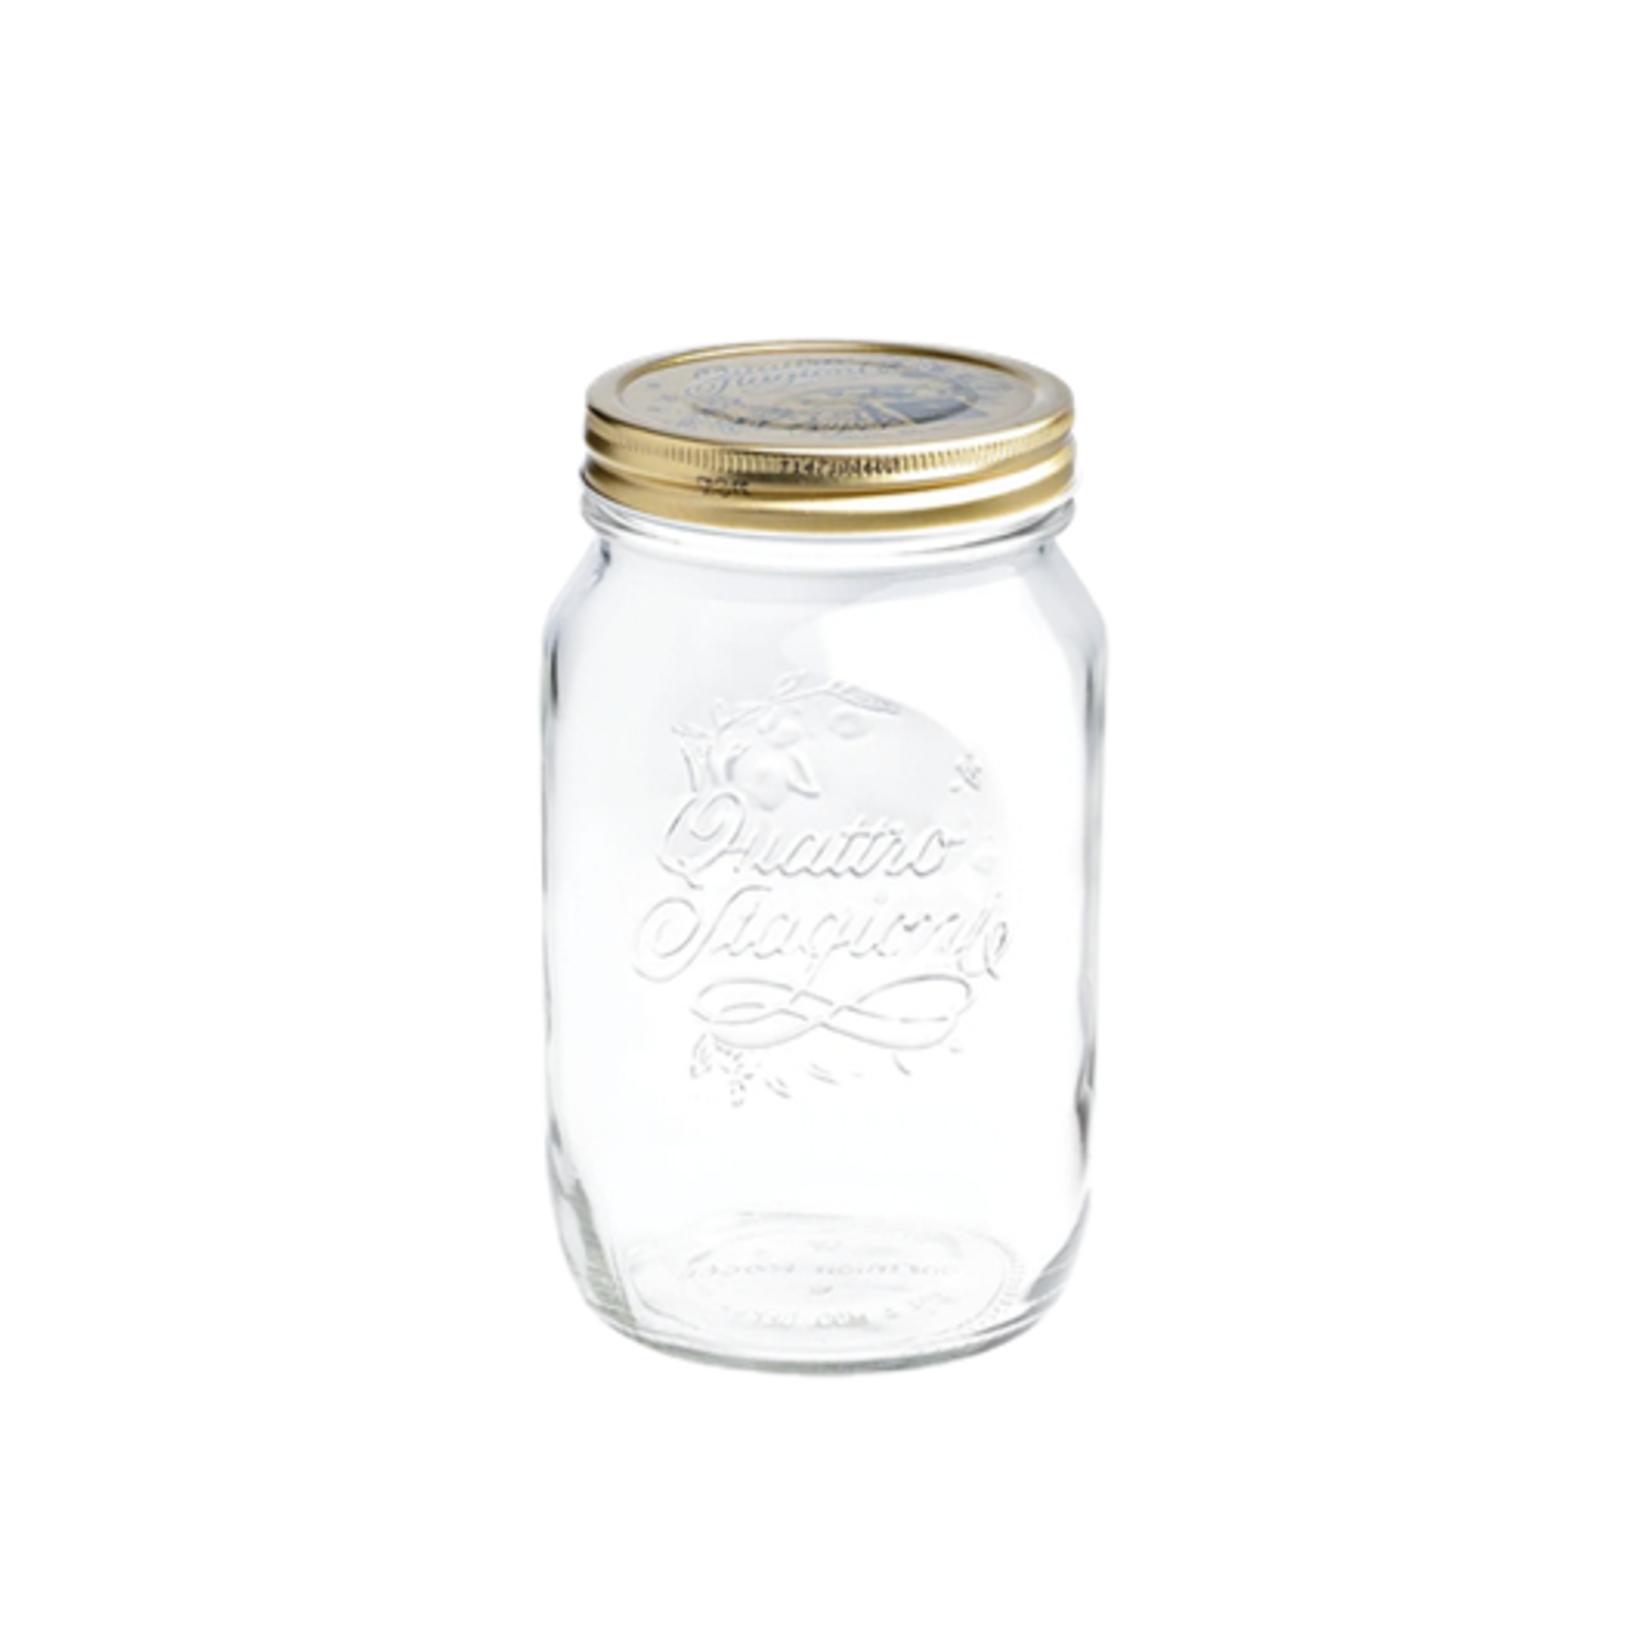 Quattro Stagioni Glass Canning Jar, 17 oz.